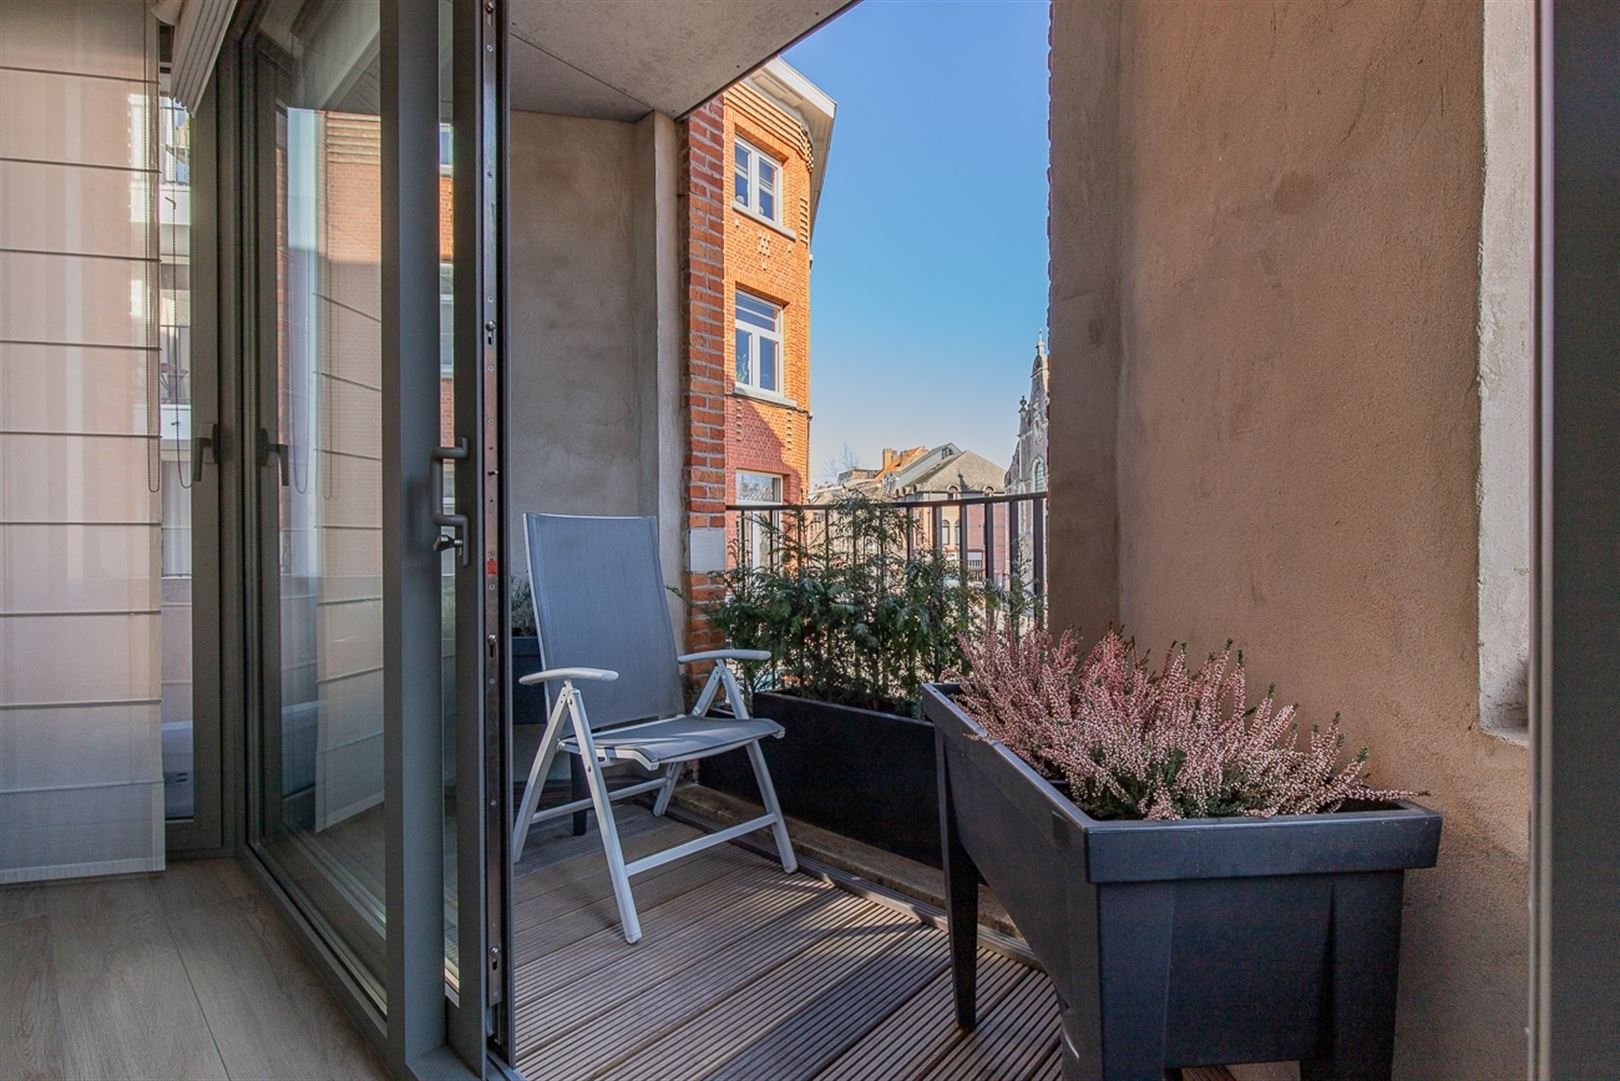 Foto 3 : Appartement te 9200 DENDERMONDE (België) - Prijs € 299.000